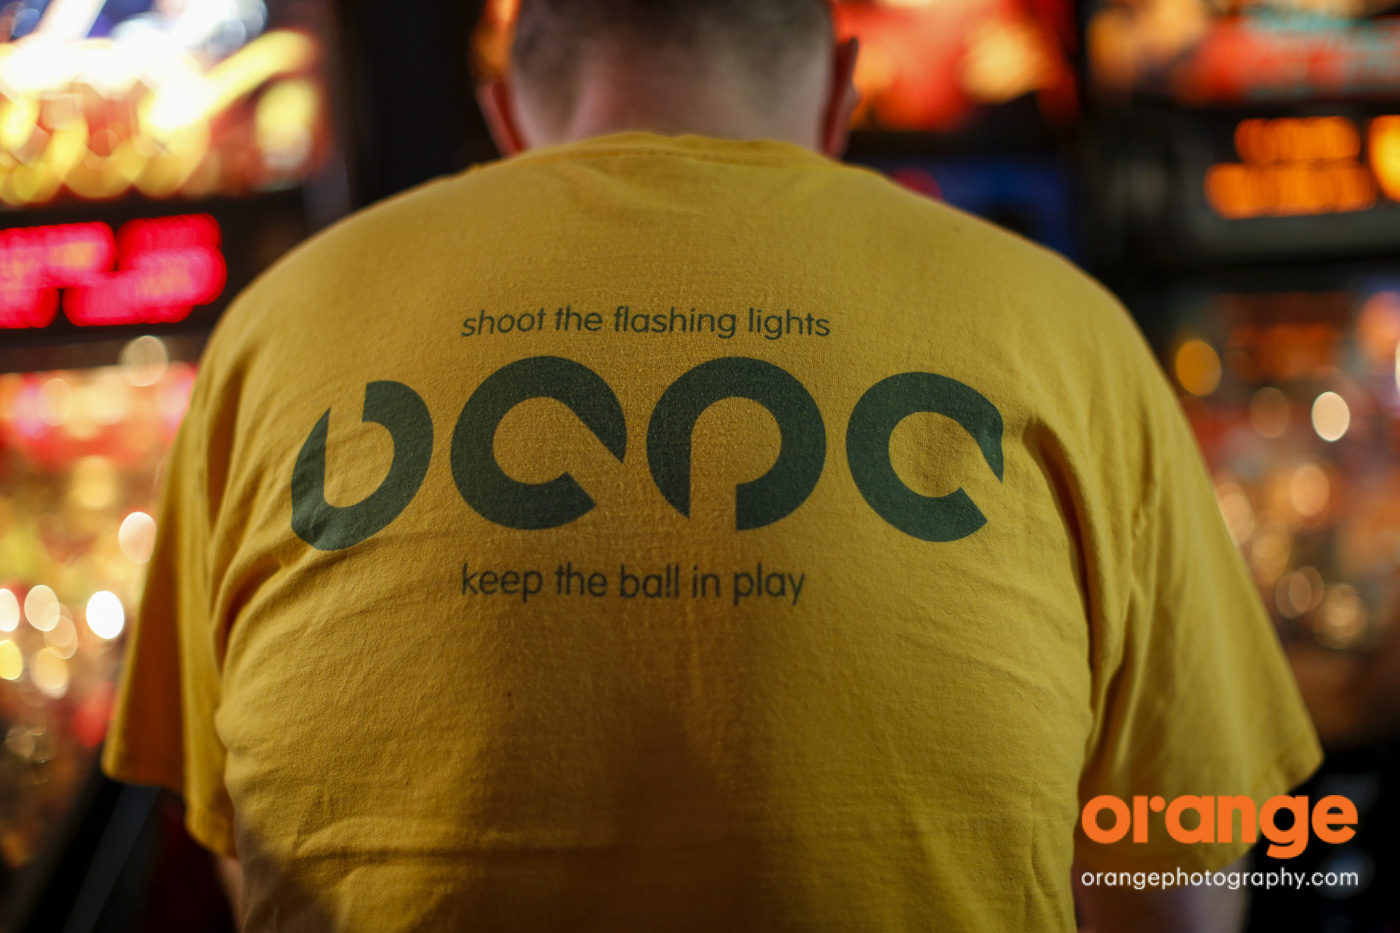 how to play pinball: shoot flashing lights, keep the ball in play #BAPA